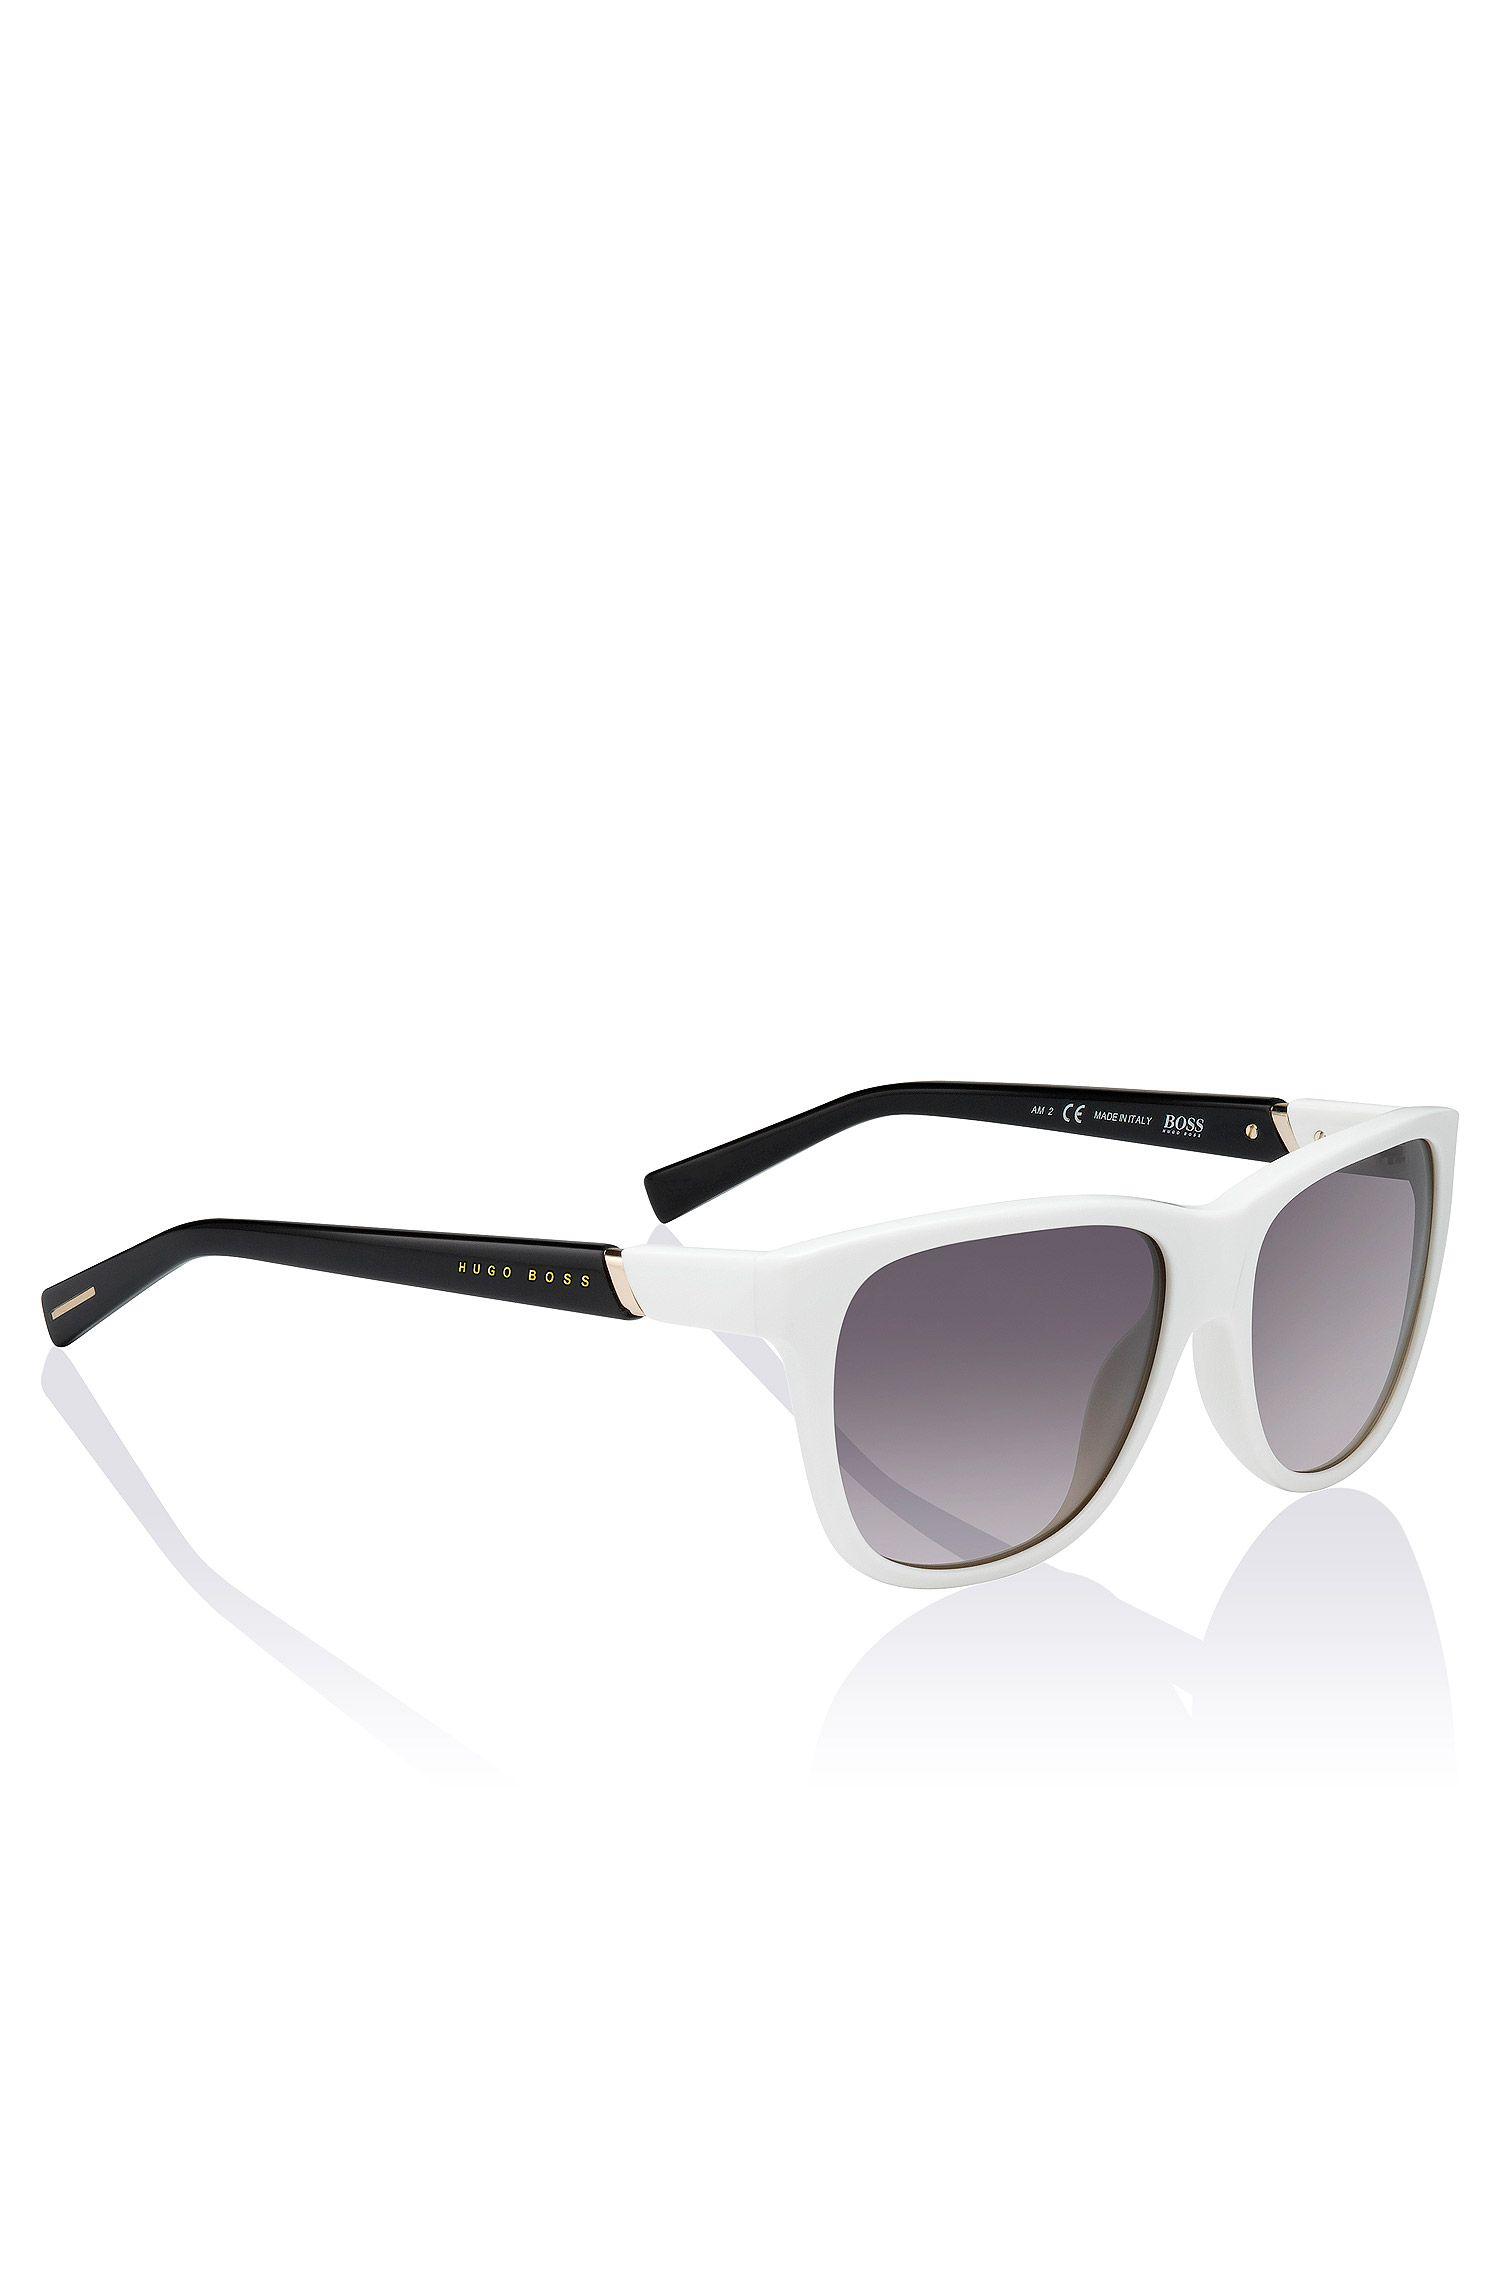 Sonnenbrille ´BOSS 0526/S` mit Golddetail